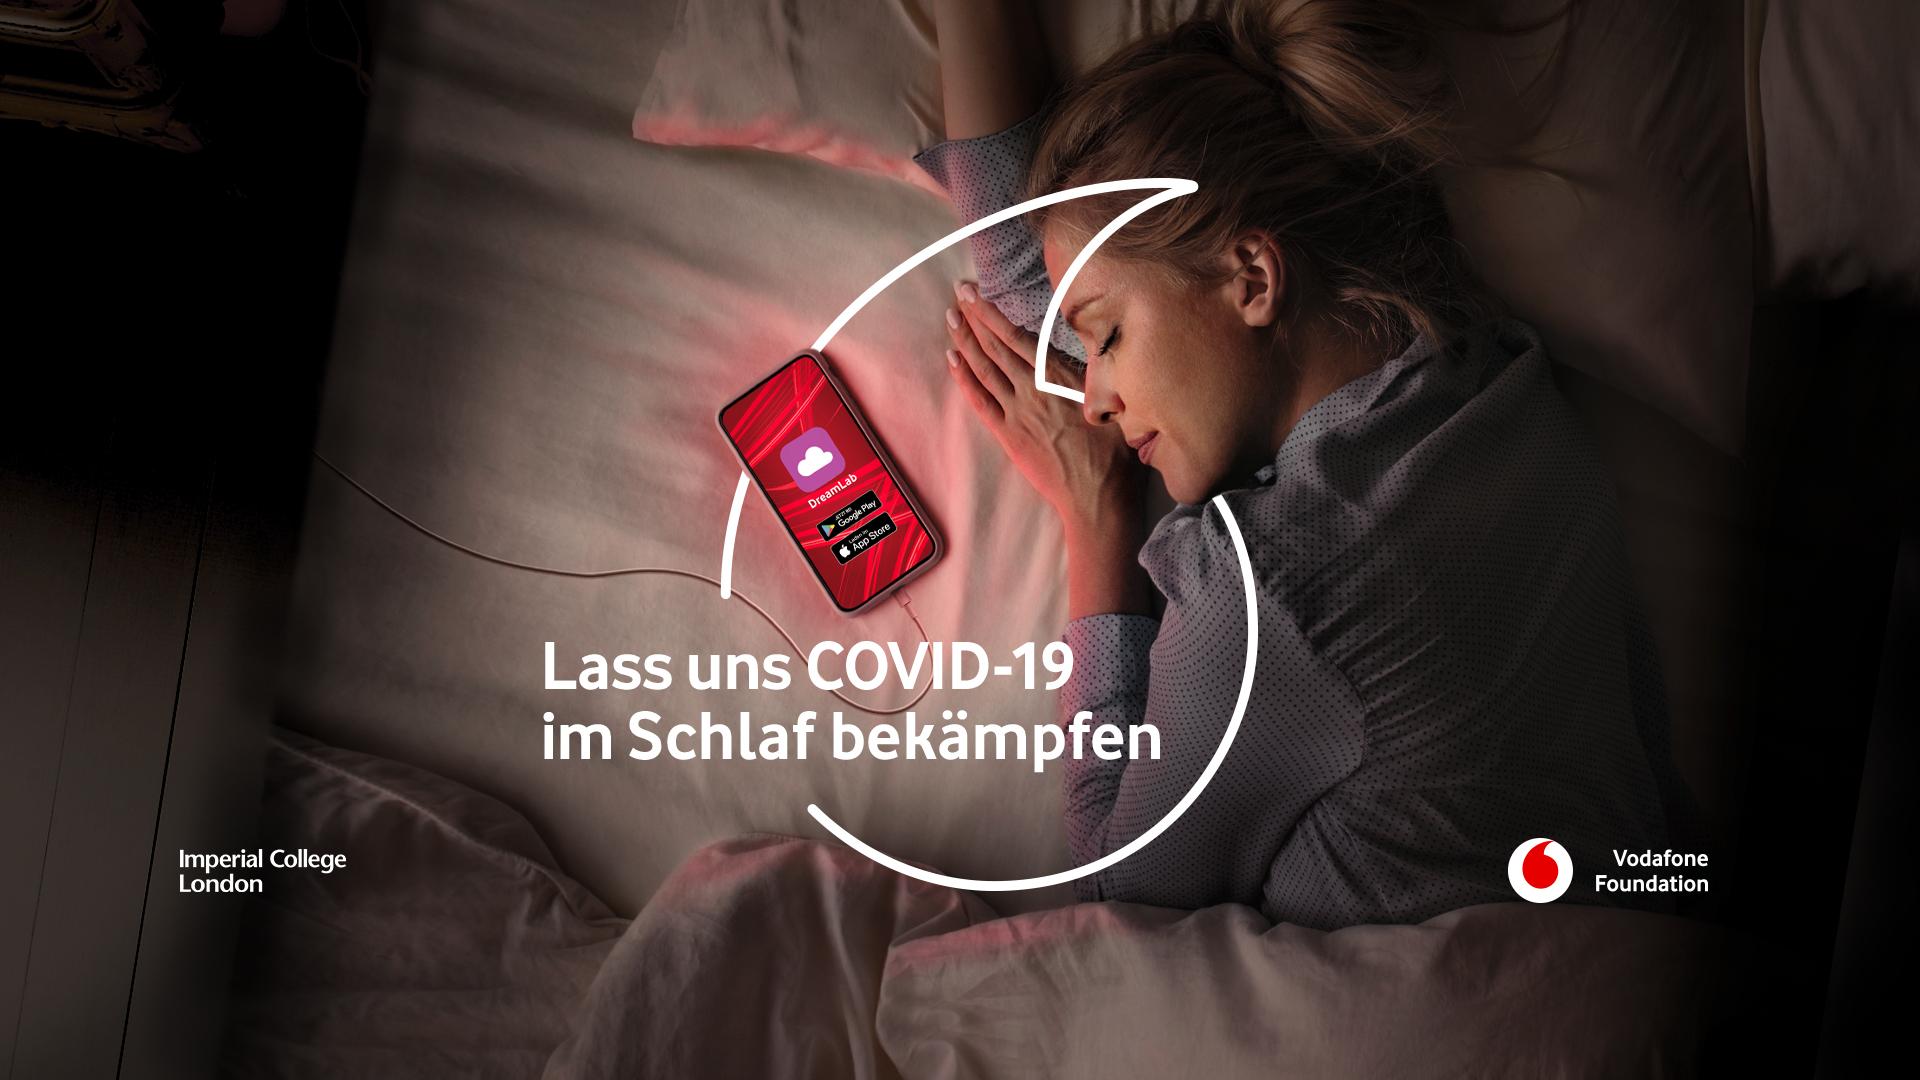 DreamLab App Vodafone